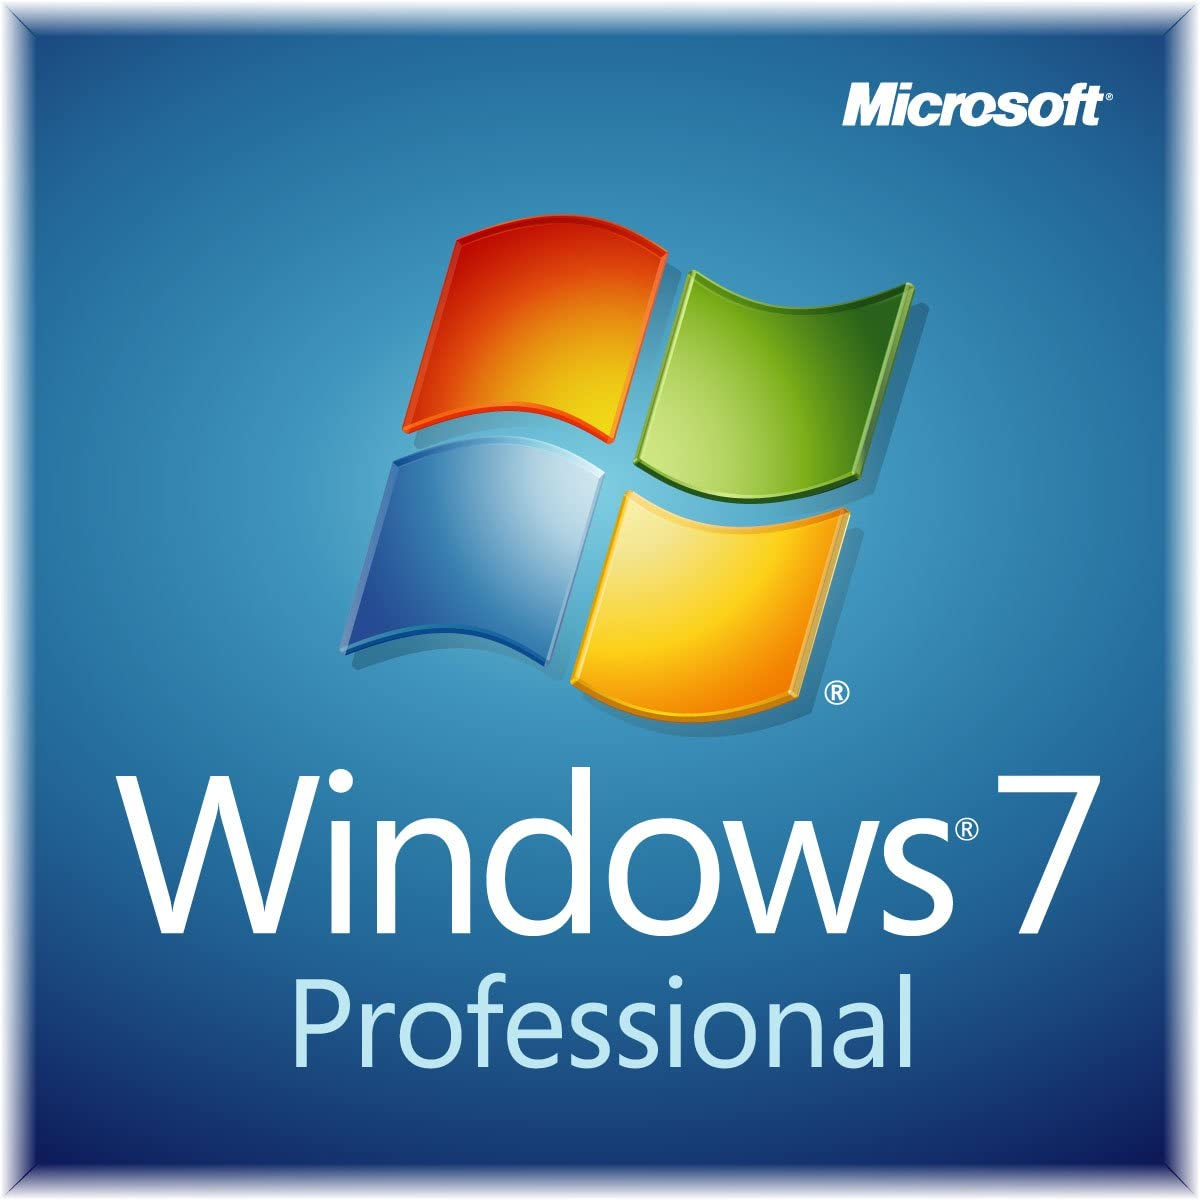 Microsoft FQC-04617 Windows 7 Professional 32BIT - Full version - 1-Pack - English - DSP OEM